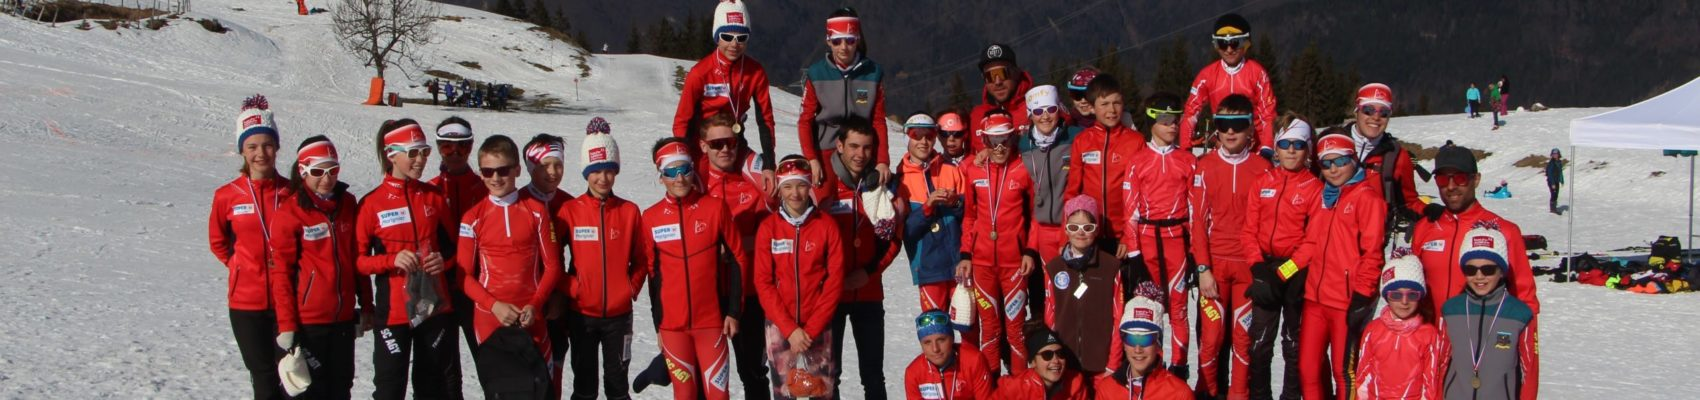 Ski Club d'Agy